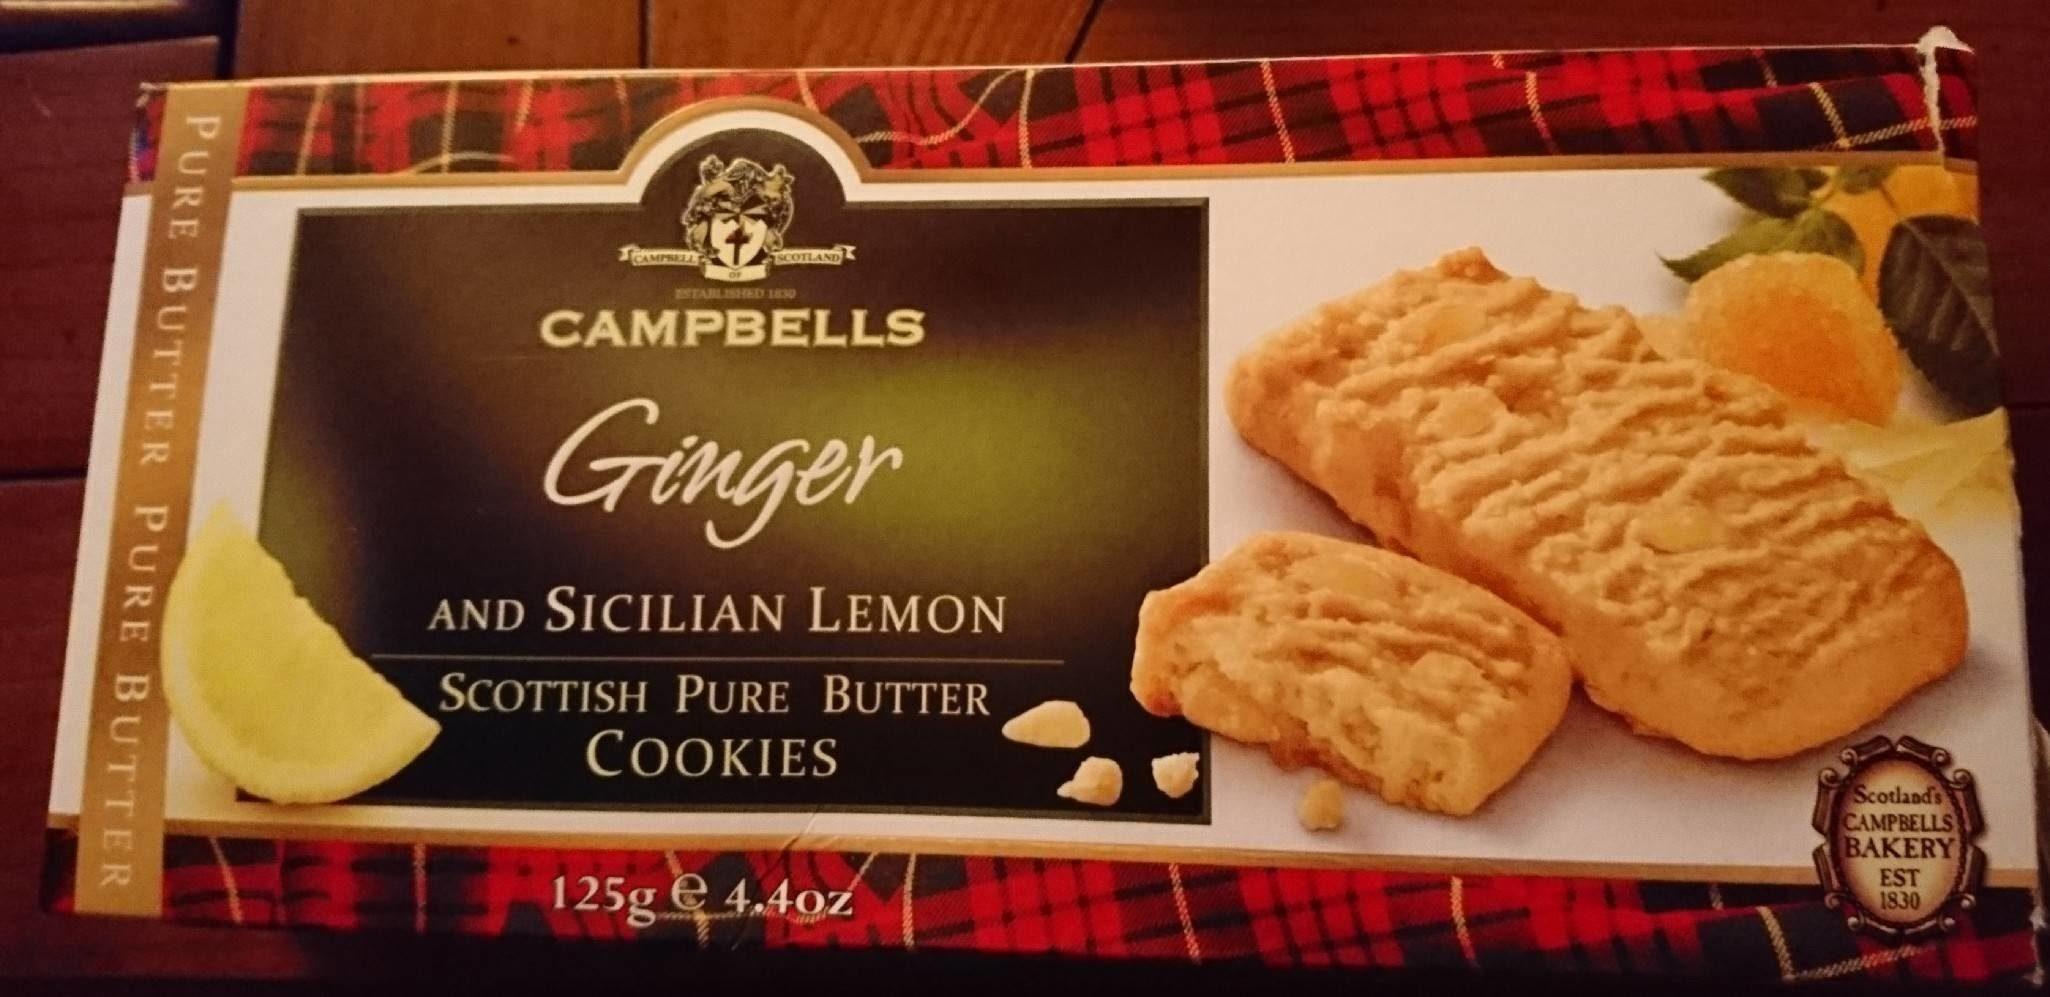 Ginger and Sicilian Lemon Scottish Pure Butter Cookies - Produit